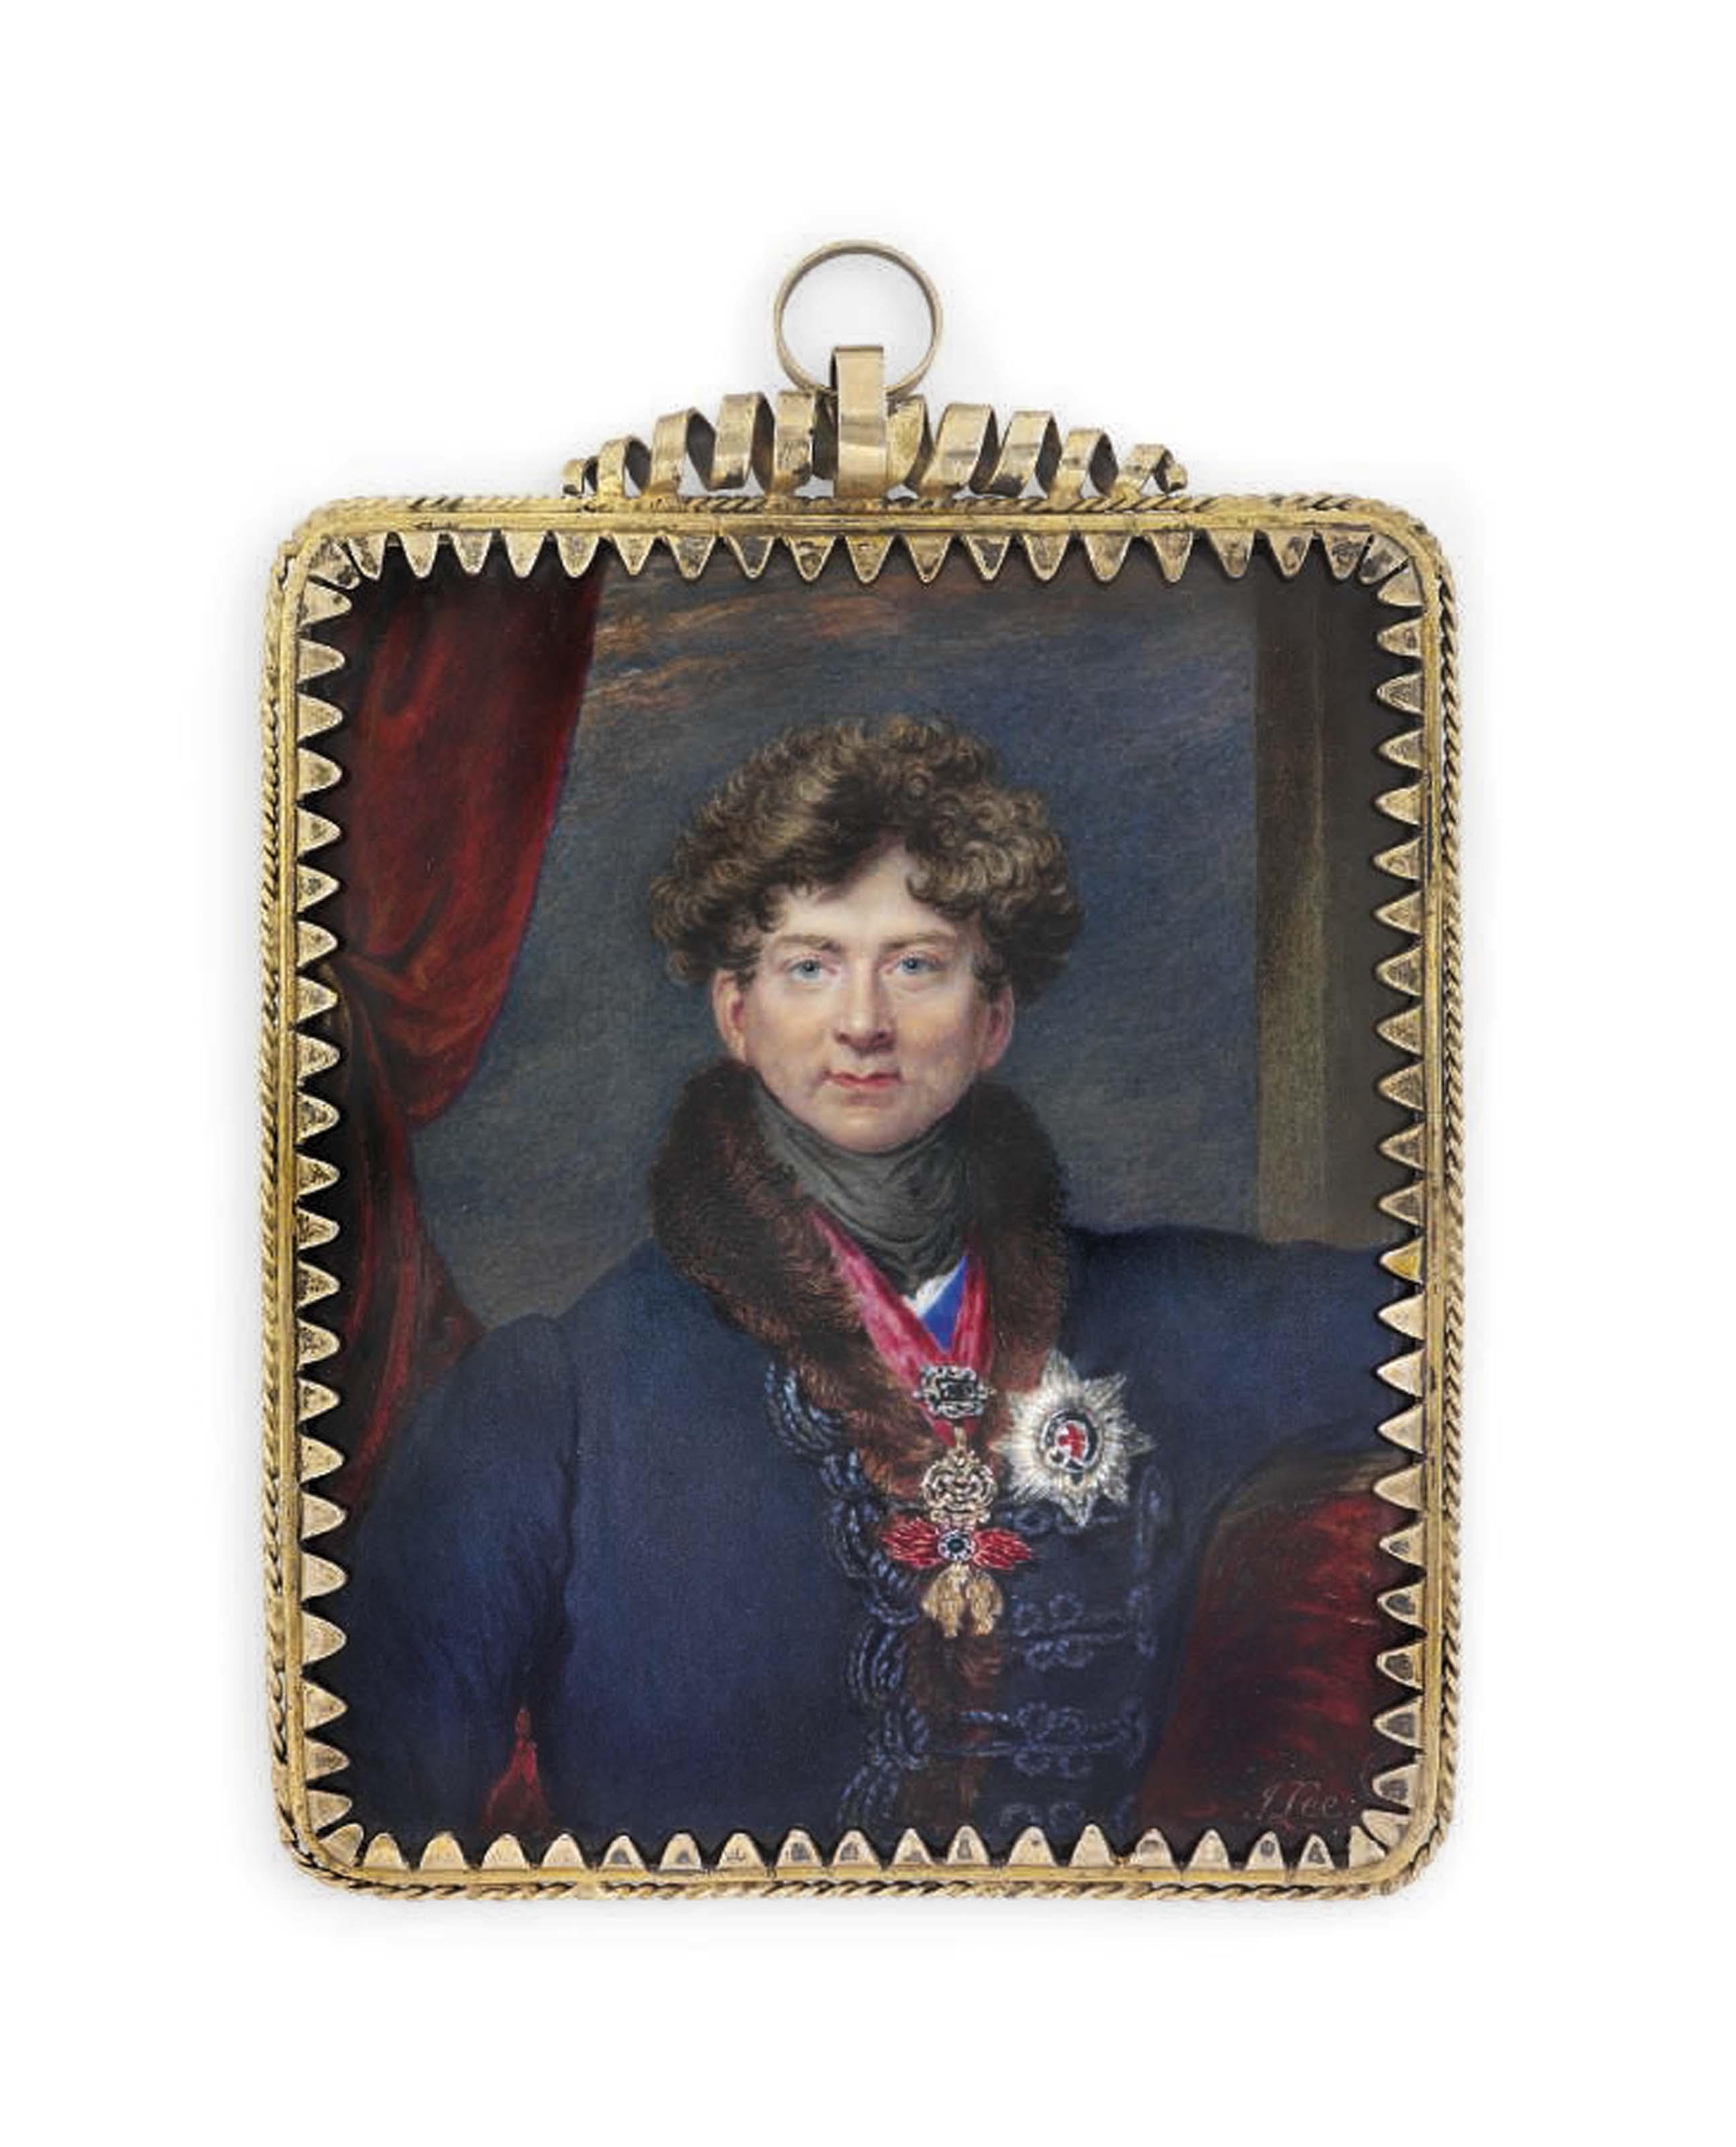 JOSEPH LEE (BRITISH, 1780-1859) AFTER SIR THOMAS LAWRENCE, P.R.A. (BRITISH, 1769-1830)